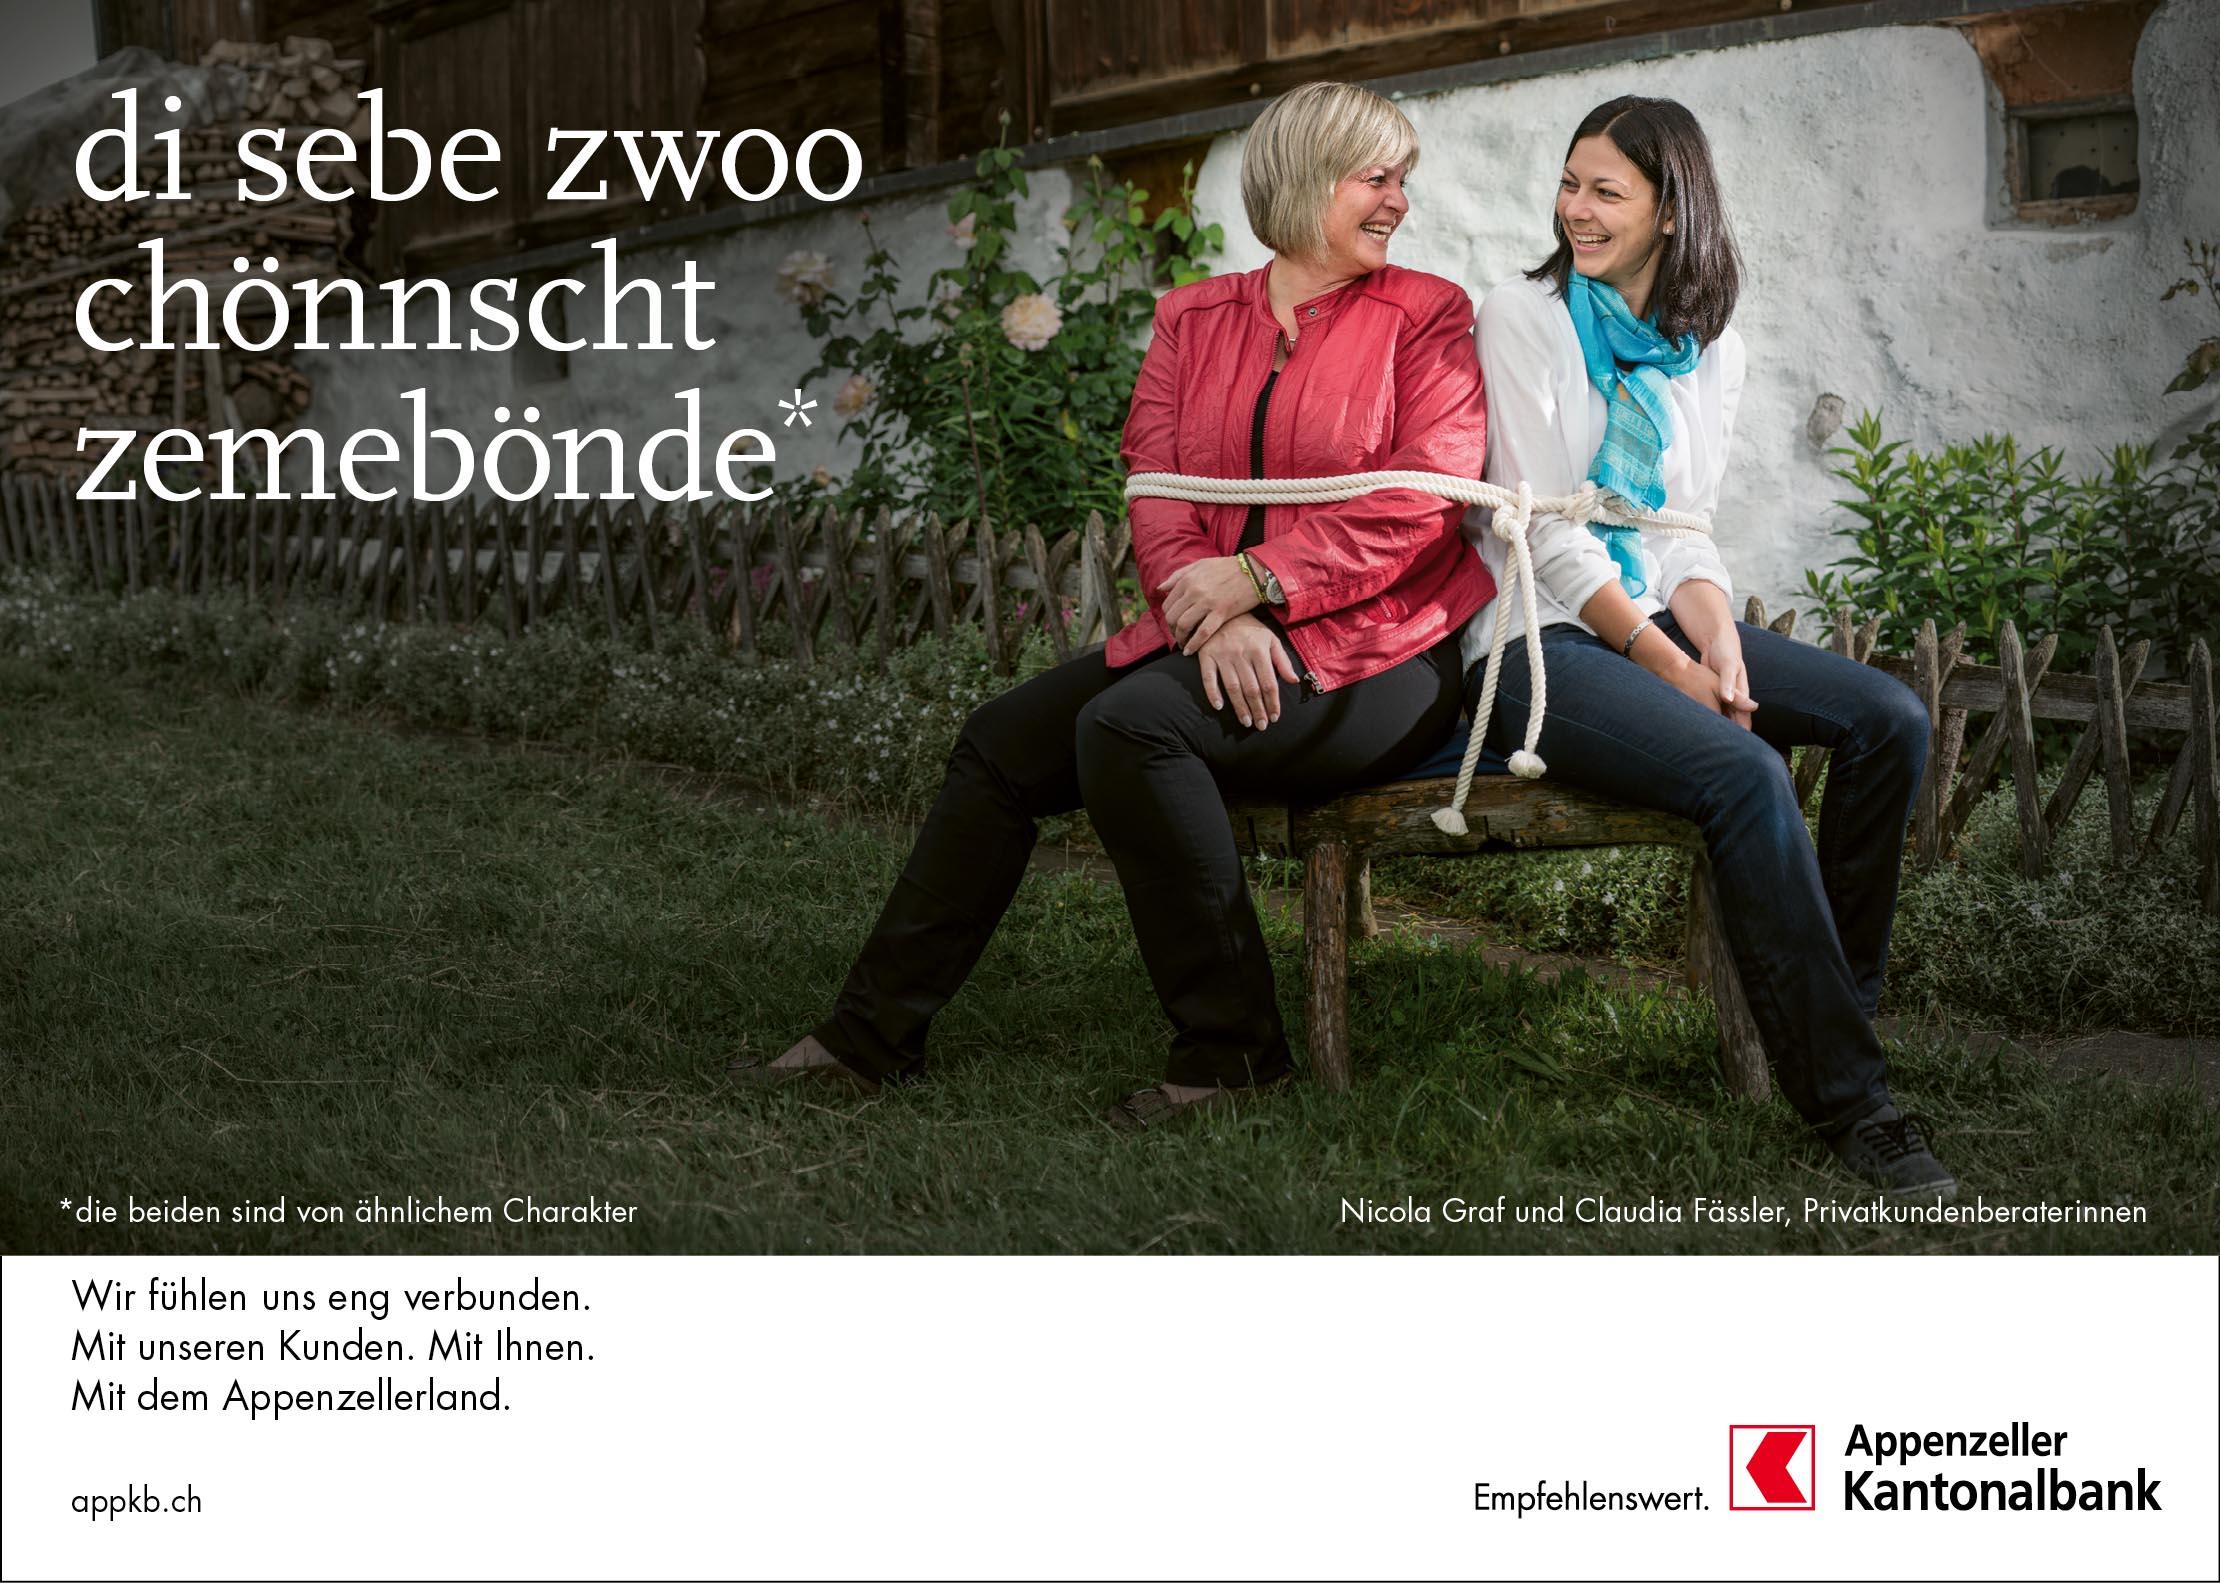 Kampagne NGR/CFA